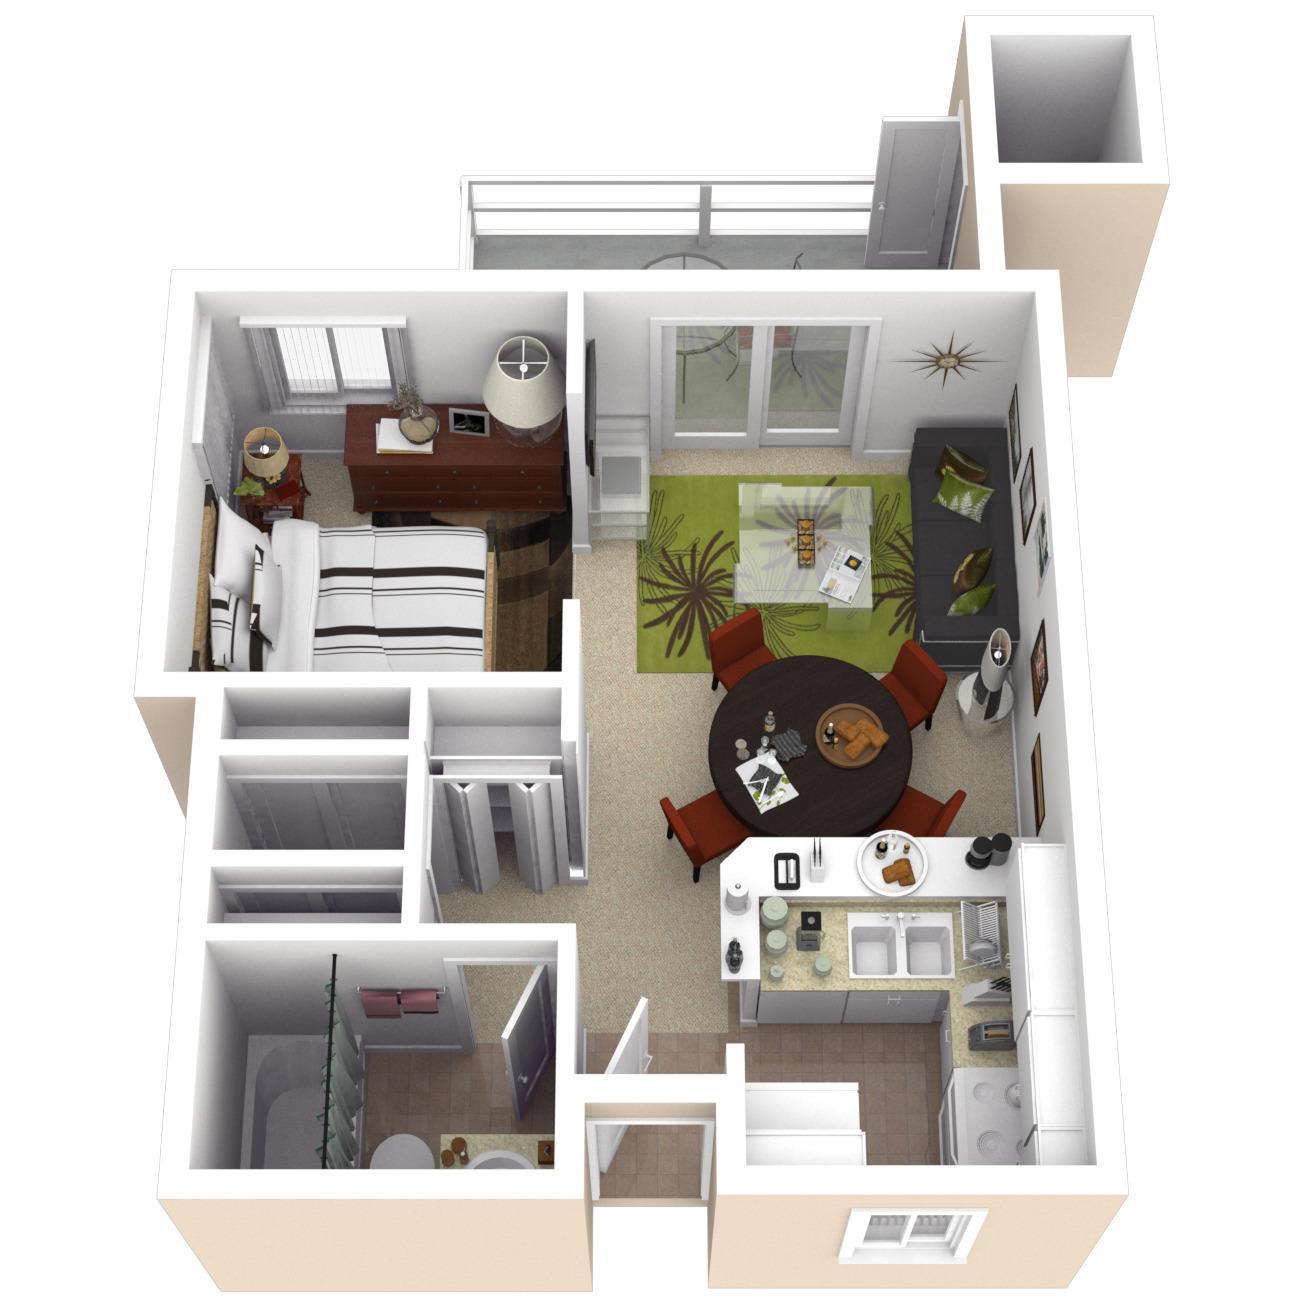 Costa Mesa Apartments For Rent: Camden Martinique, Costa Mesa CA